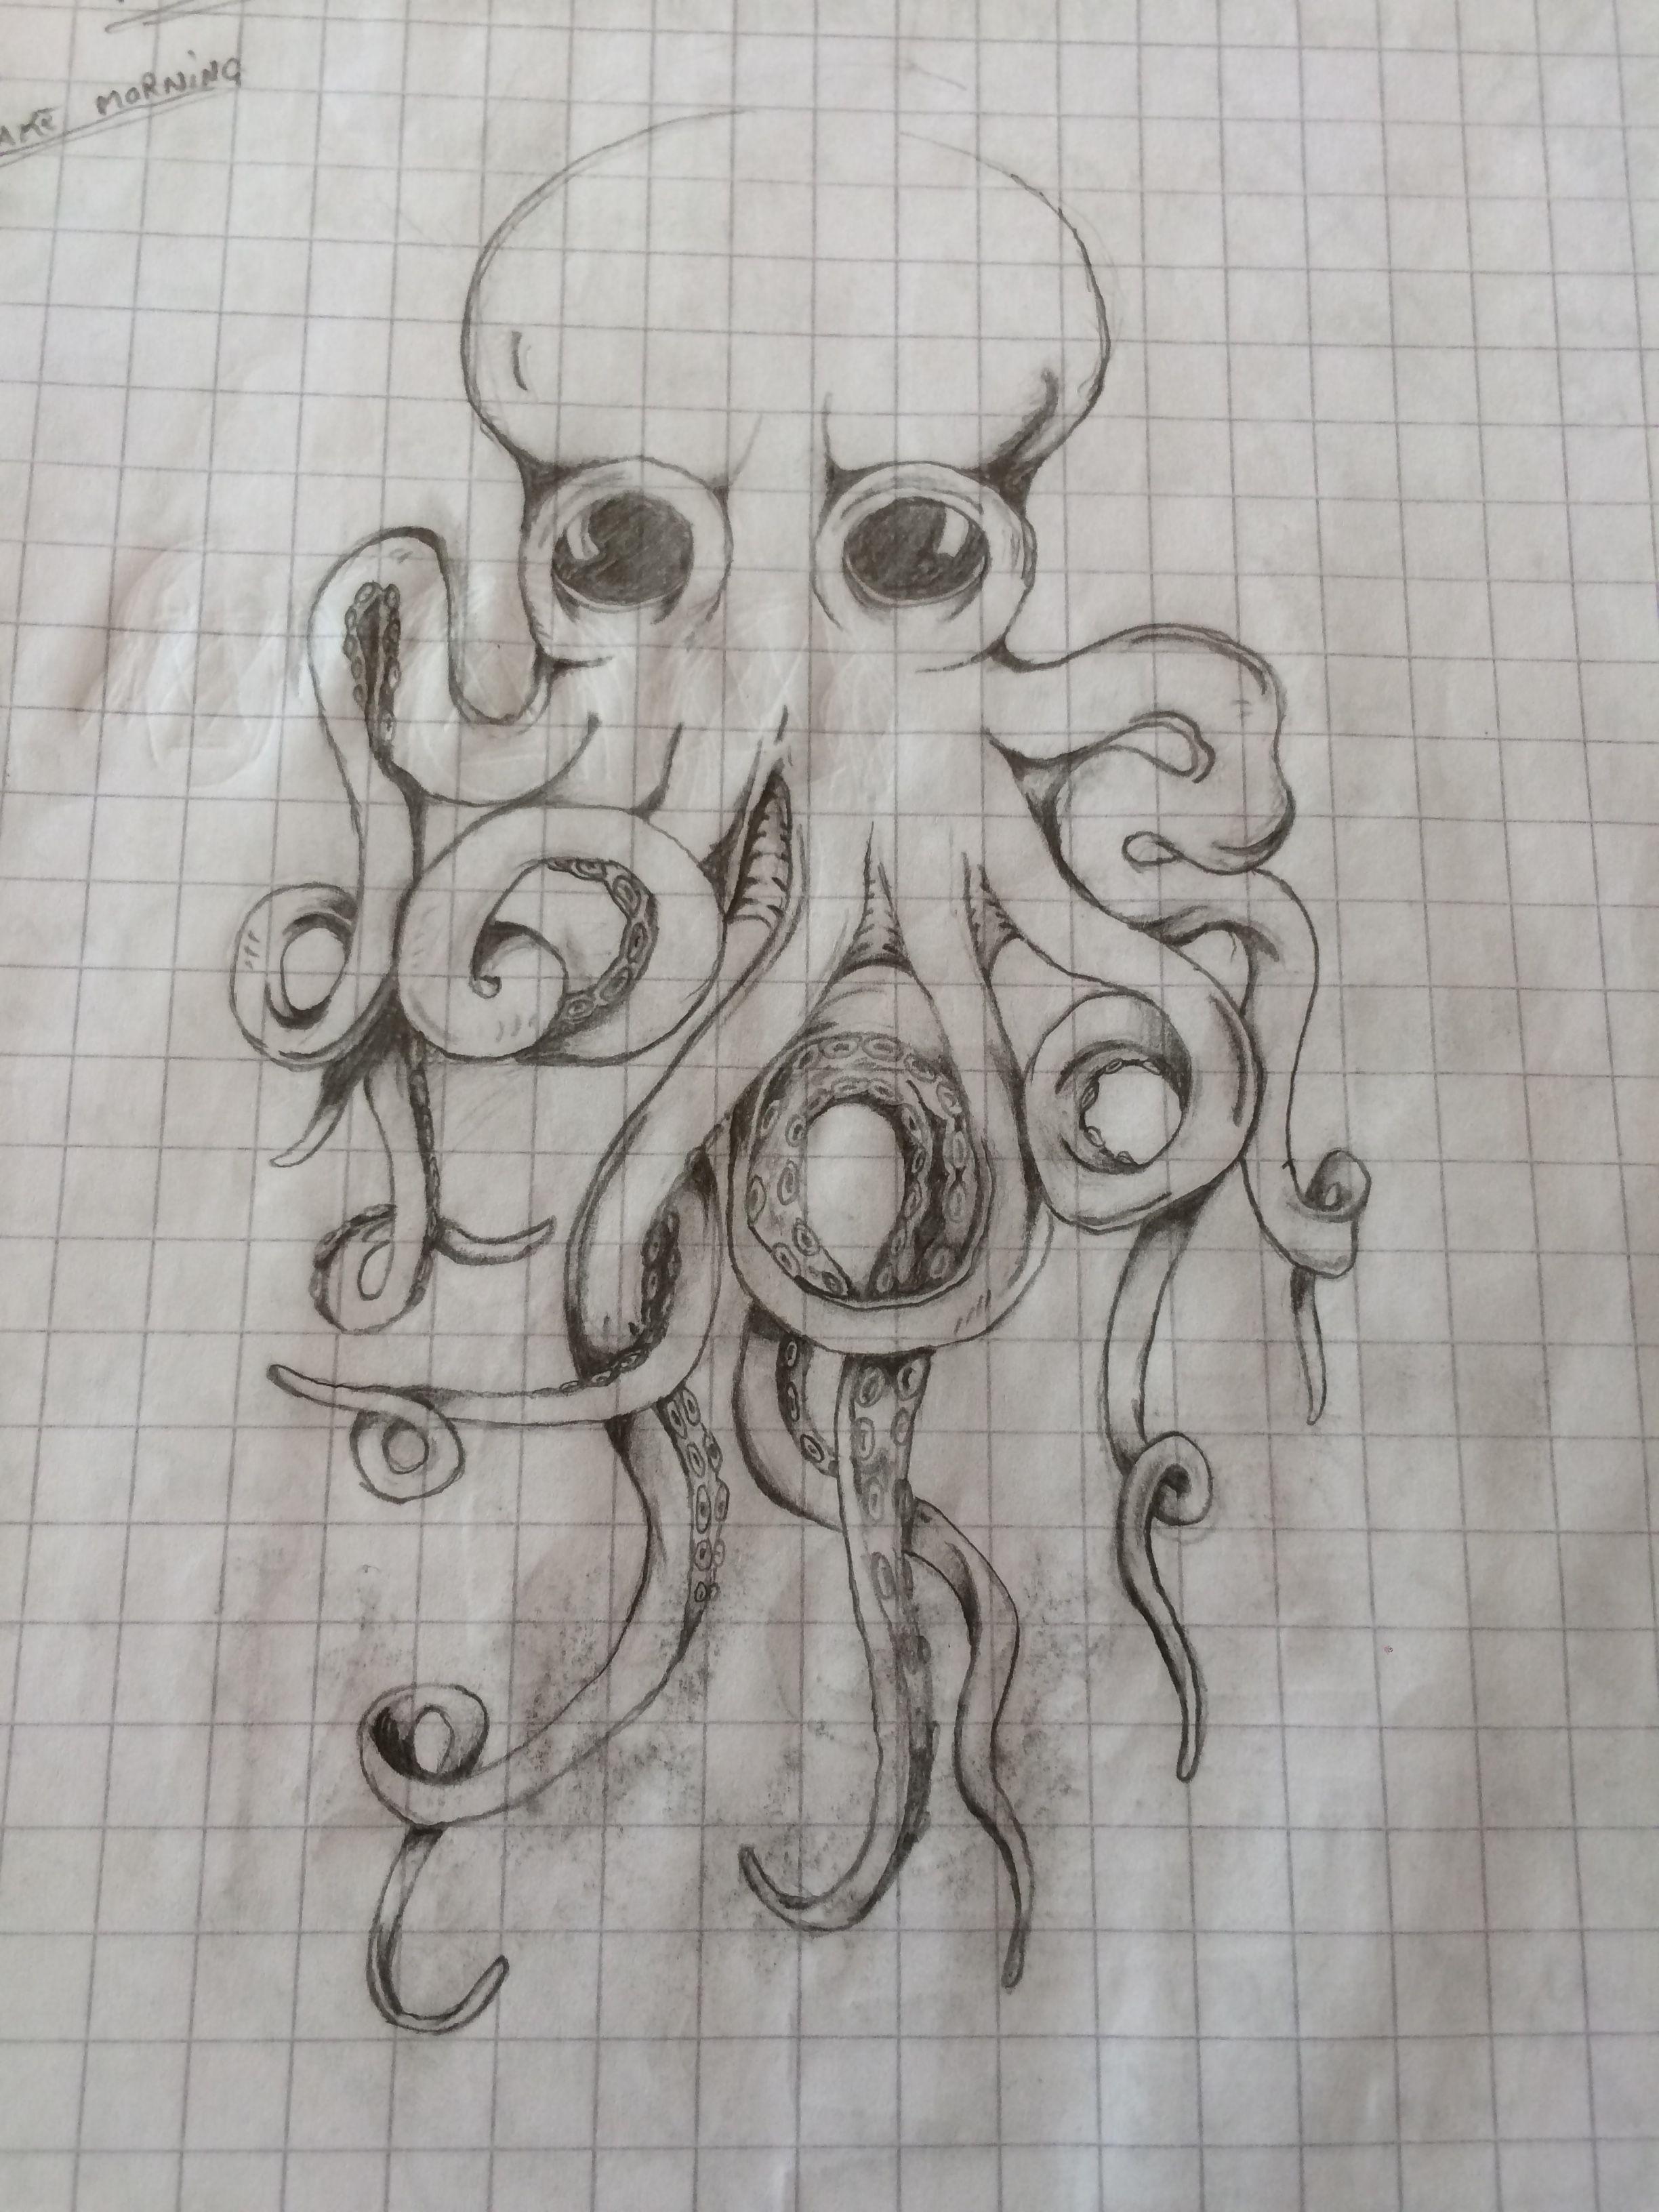 Octopus tattoo john frusciante Blood Sugar